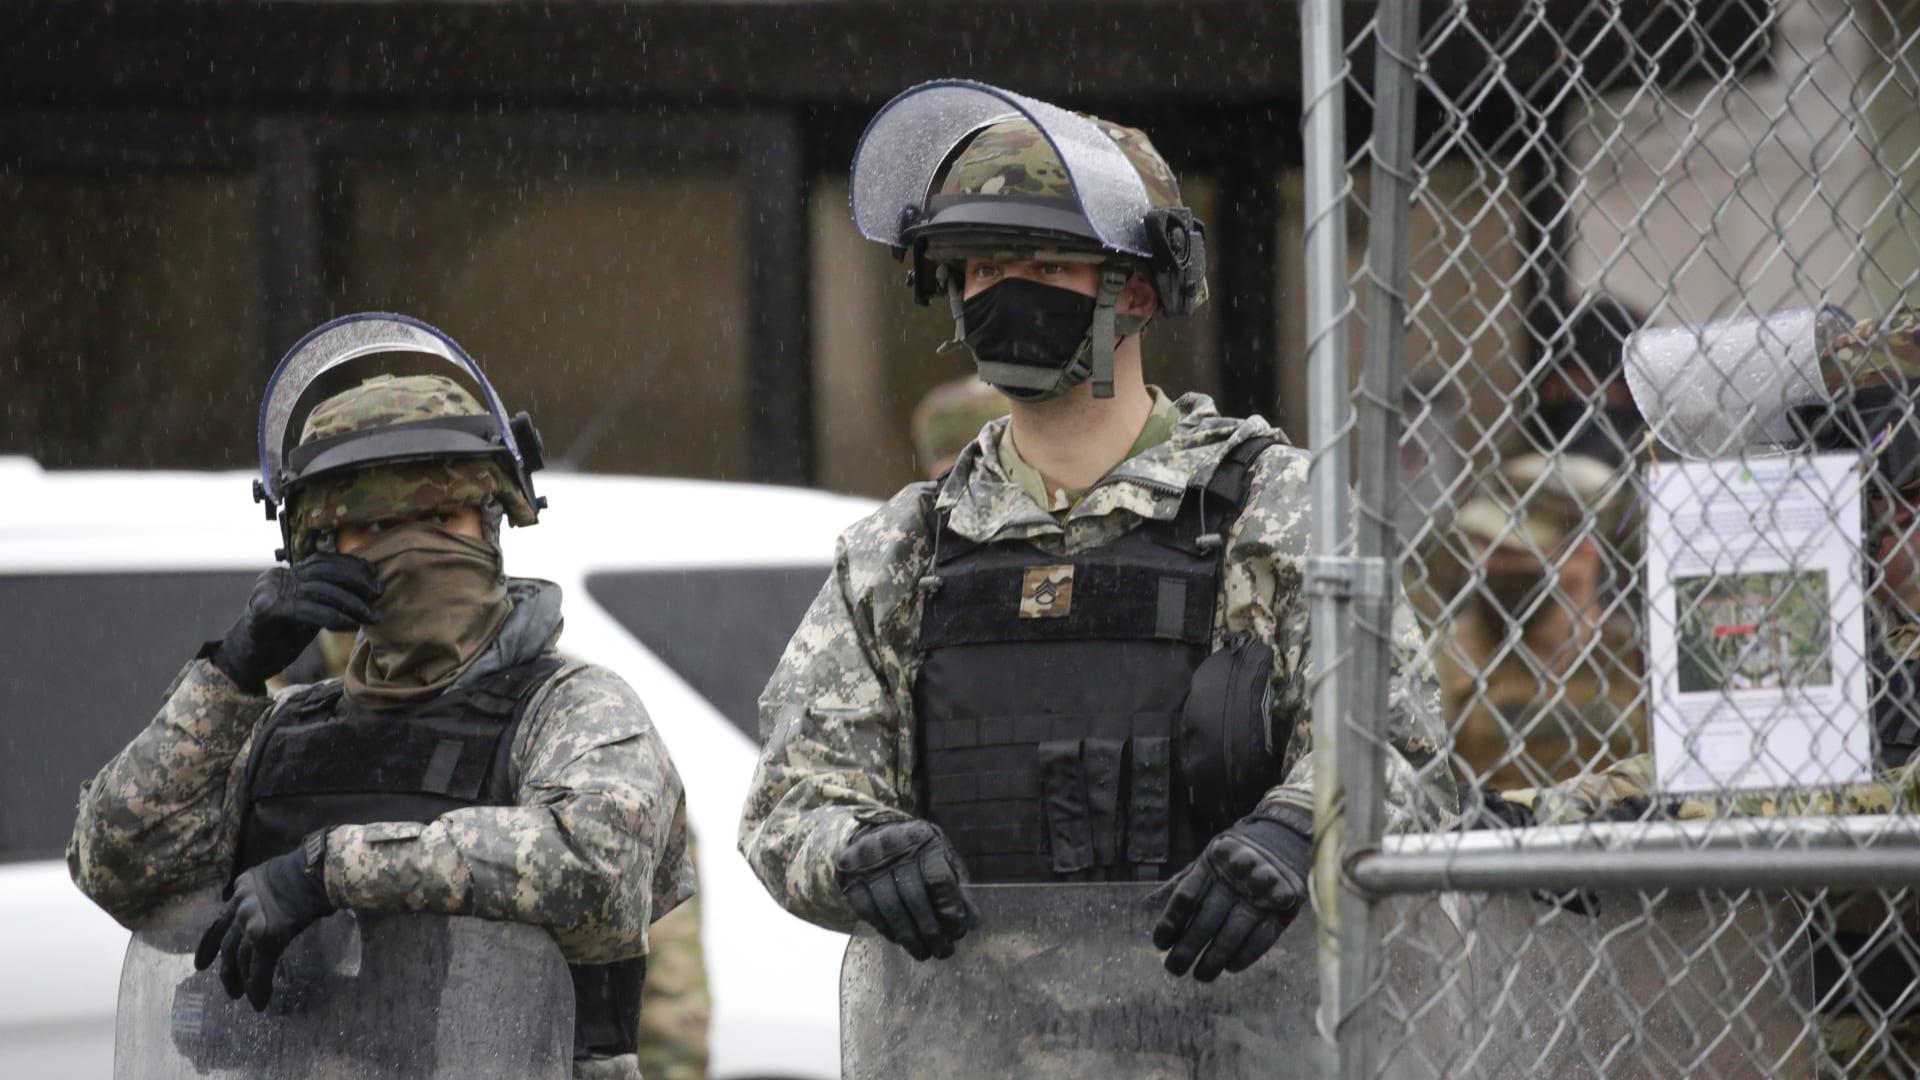 "FBI يحذر من ""مظاهرات سلمية مسلحة"" قبيل تنصيب بايدن.. ويبحث عن متطرفين محتملين"